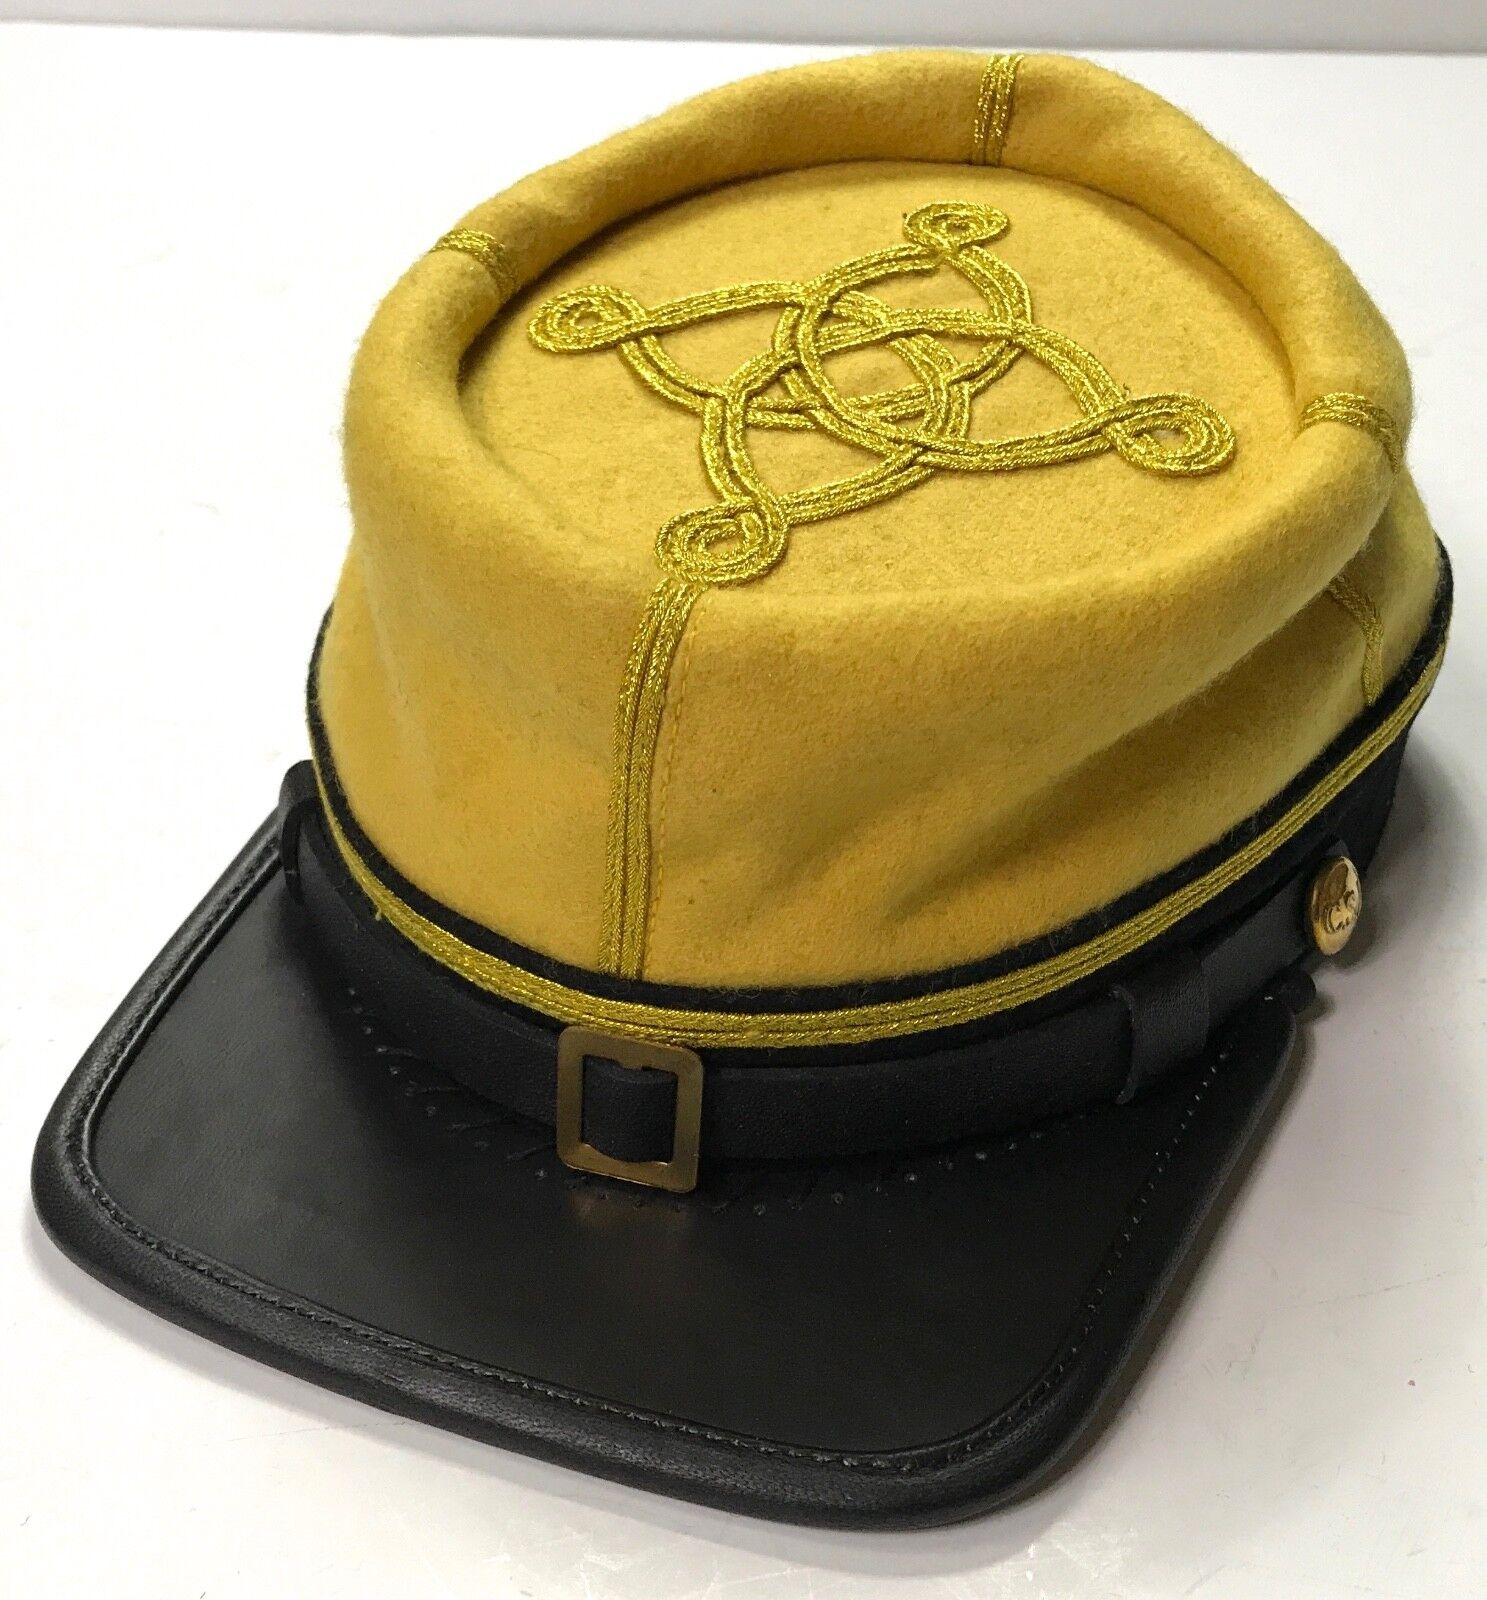 CIVIL WAR CONFEDERATE CSA COLONEL MAJOR INFANTRY OFFICER KEPI FORAGE CAP-LARGE